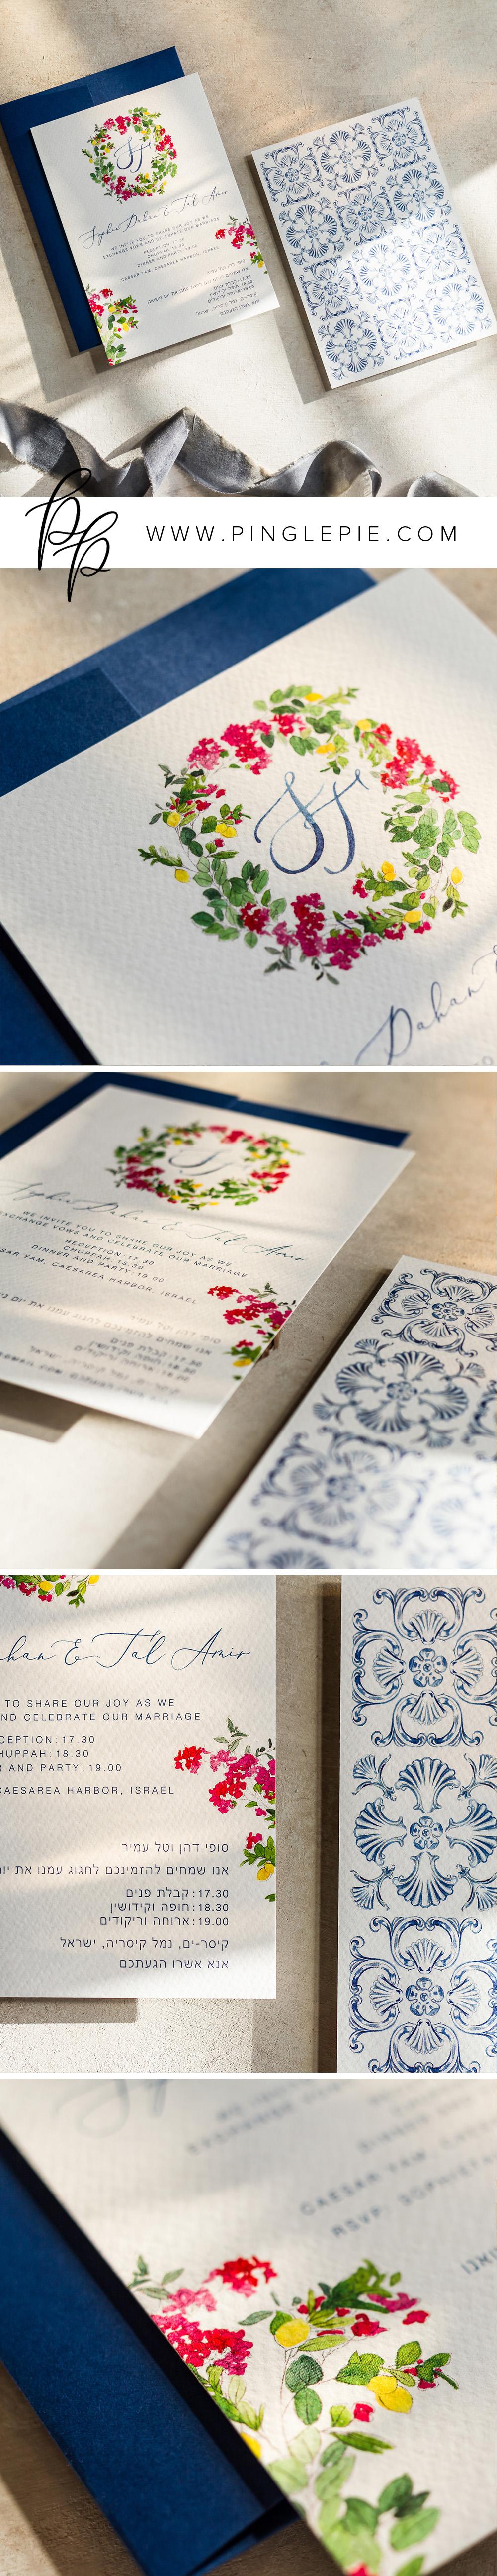 Sophie & Tal Custom Design.jpg